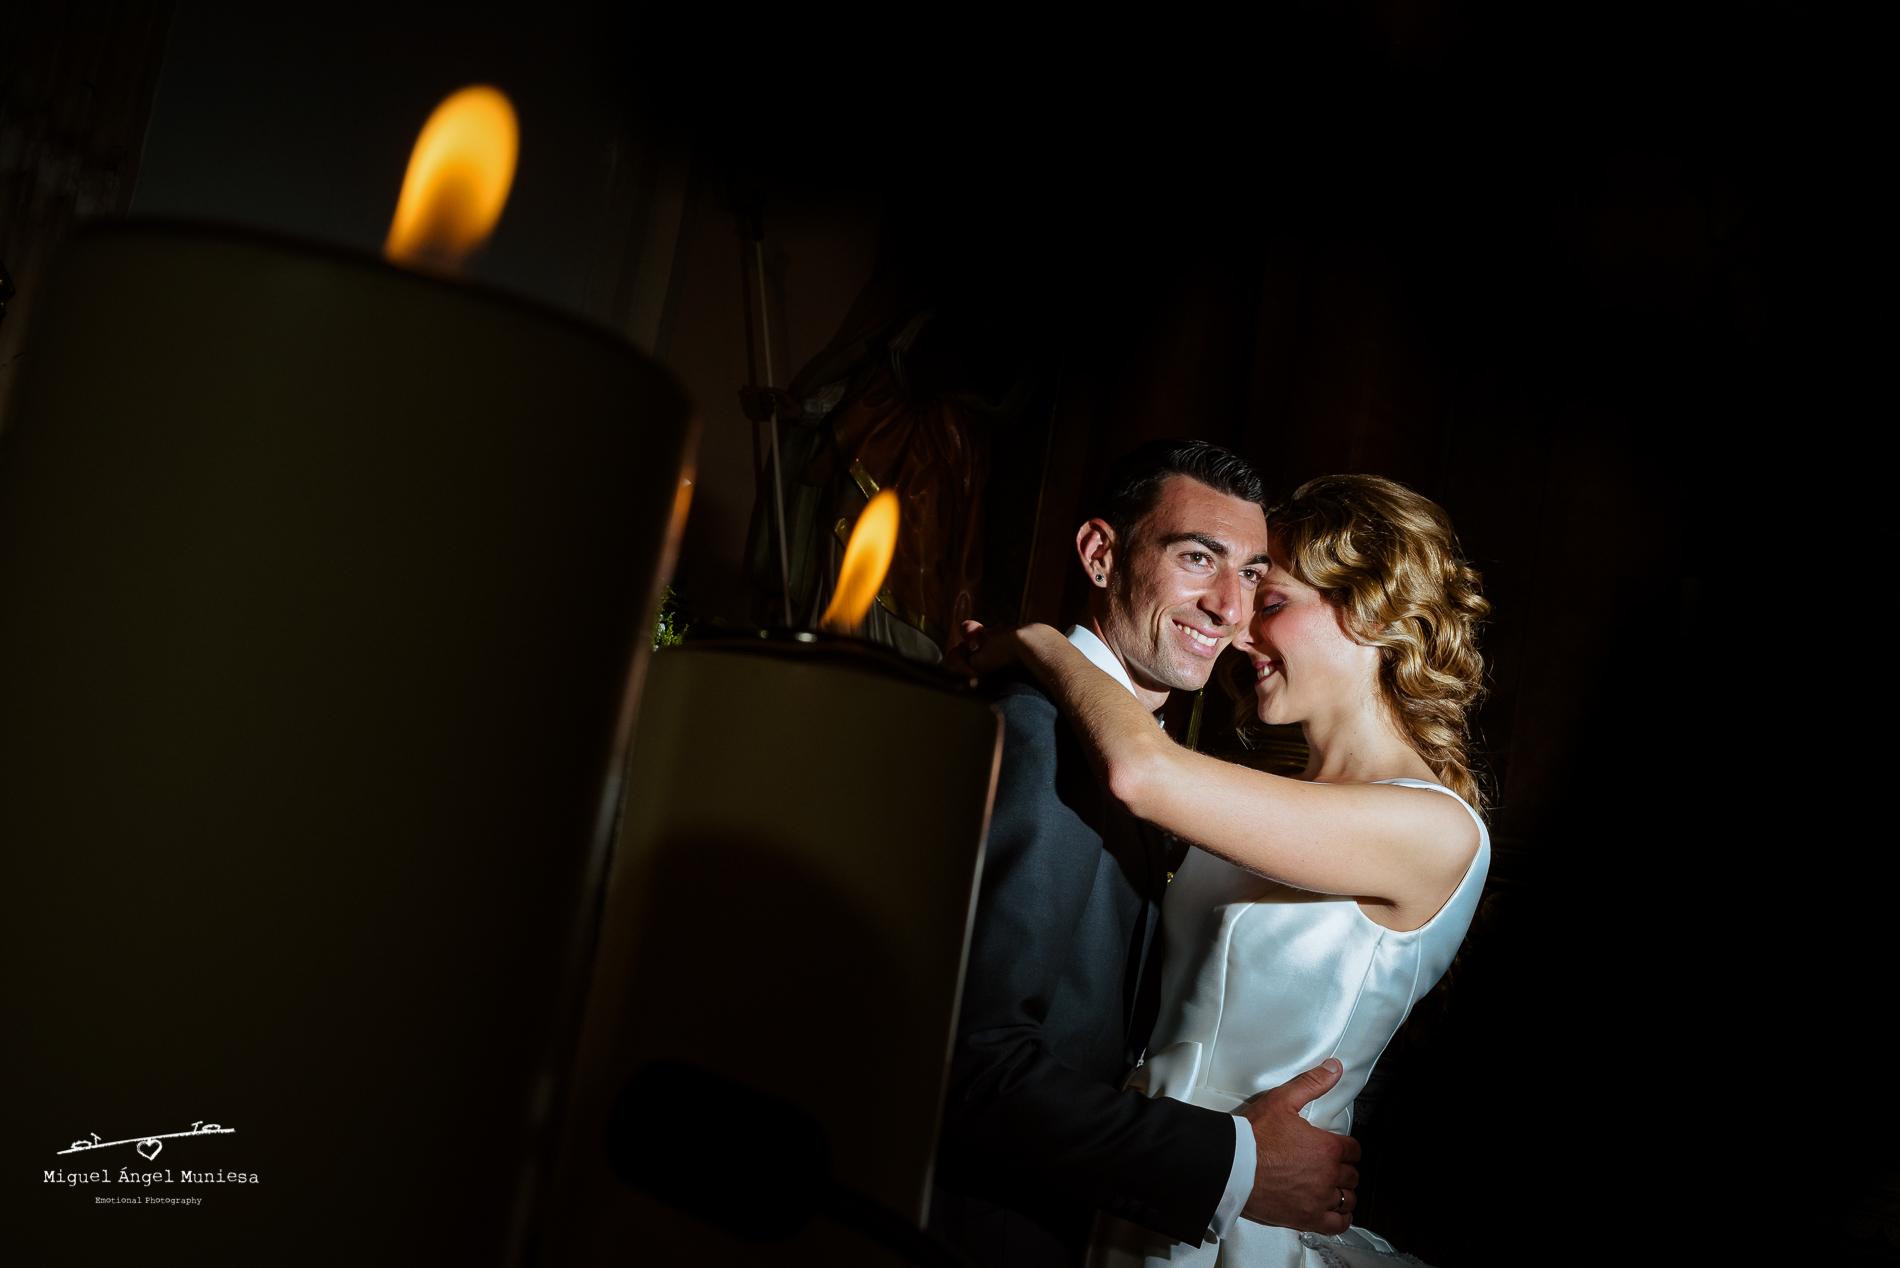 boda, fotografia de boda, boda zaragoza, fotografia, wedding, wedding photography, miguel angel muniesa, fotografo boda Zaragoza, fotografo boda, destination wedding_ 028